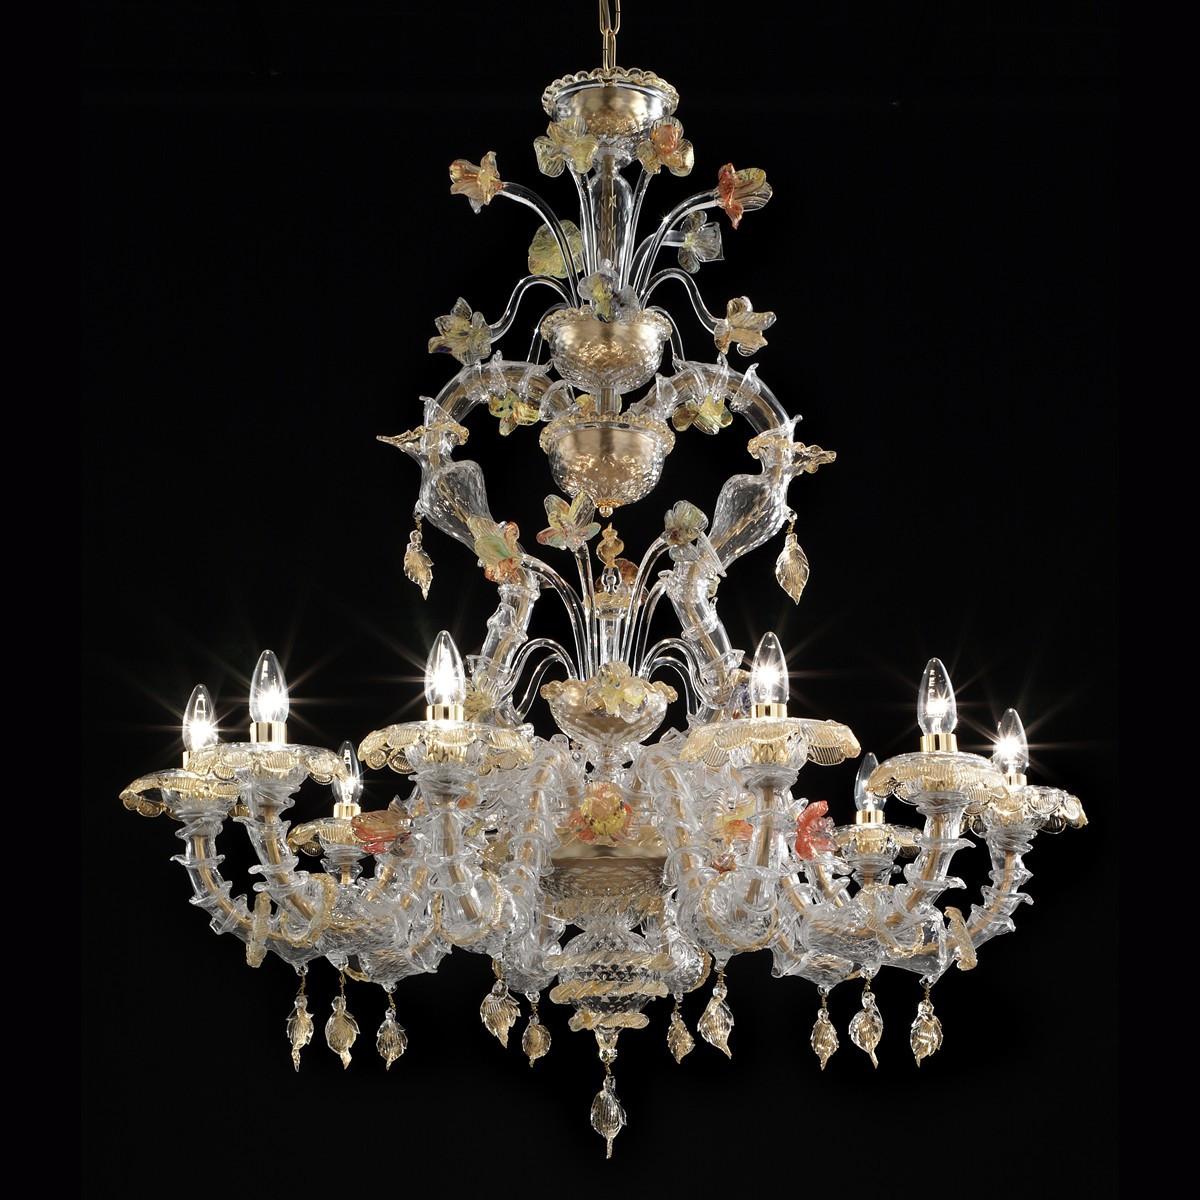 Fondaco 10 lights Murano chandelier - transparent gold polychrome